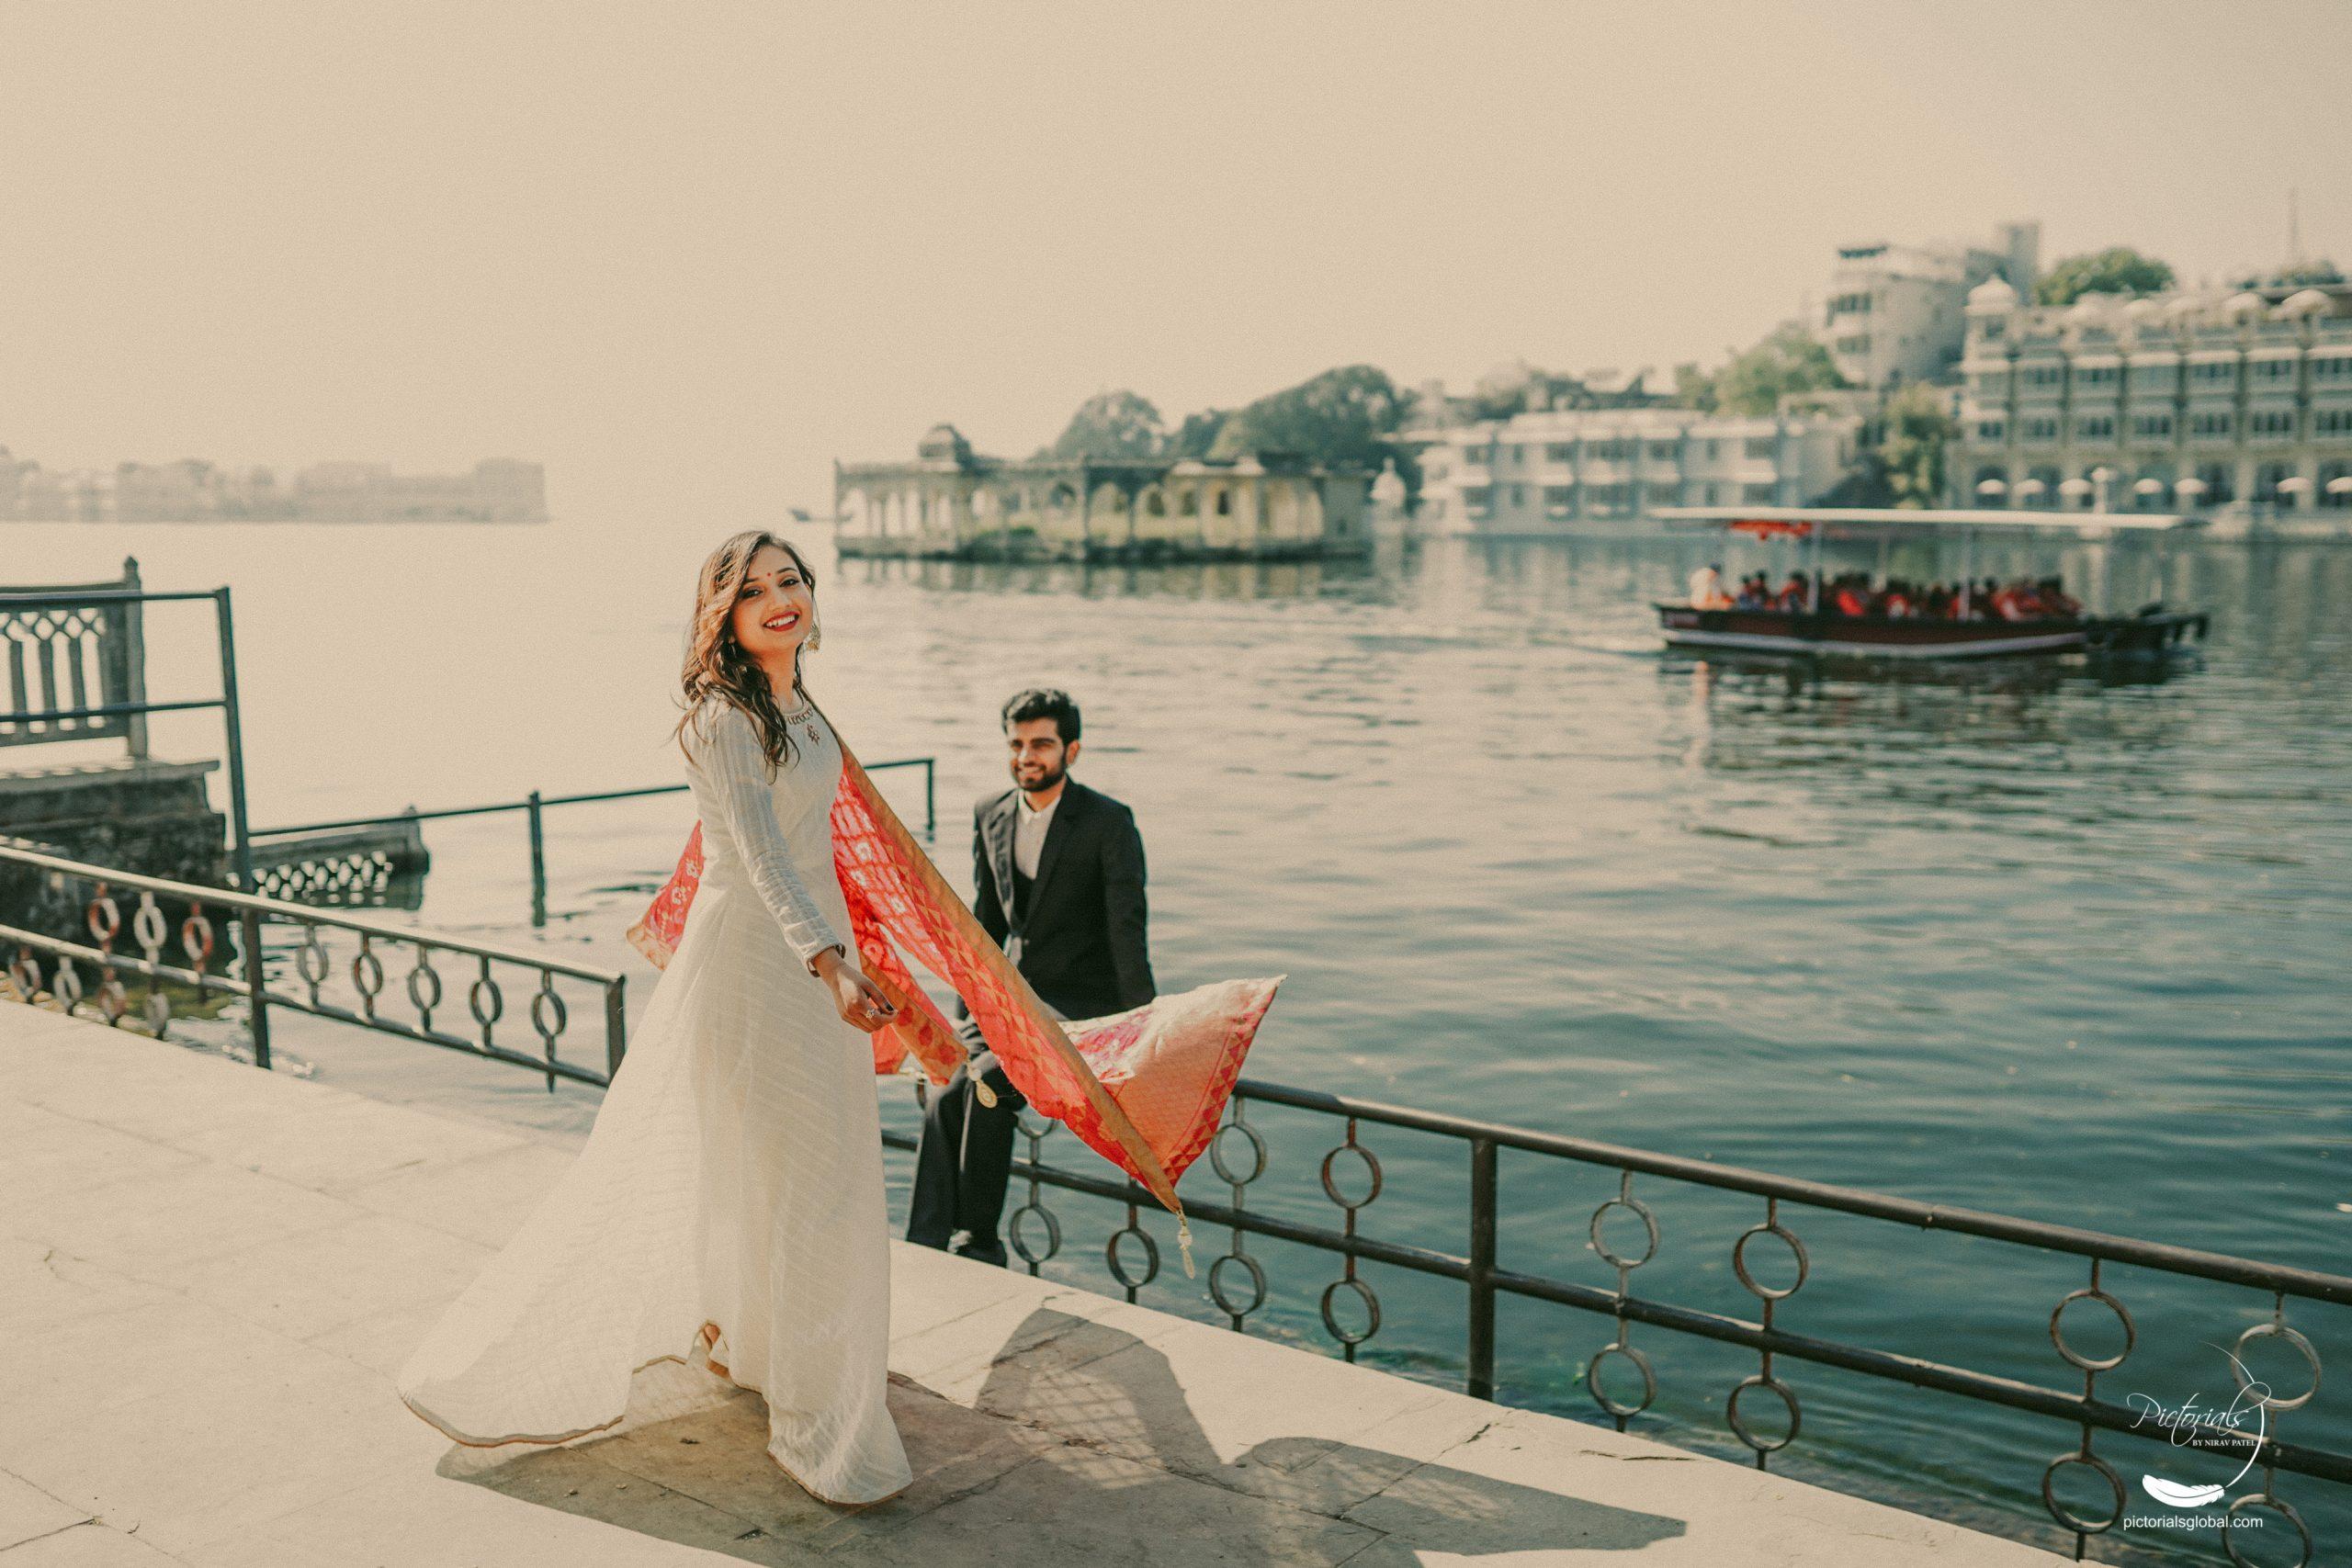 Pre Wedding Photoshoot in Udaipur by Nirav Patel